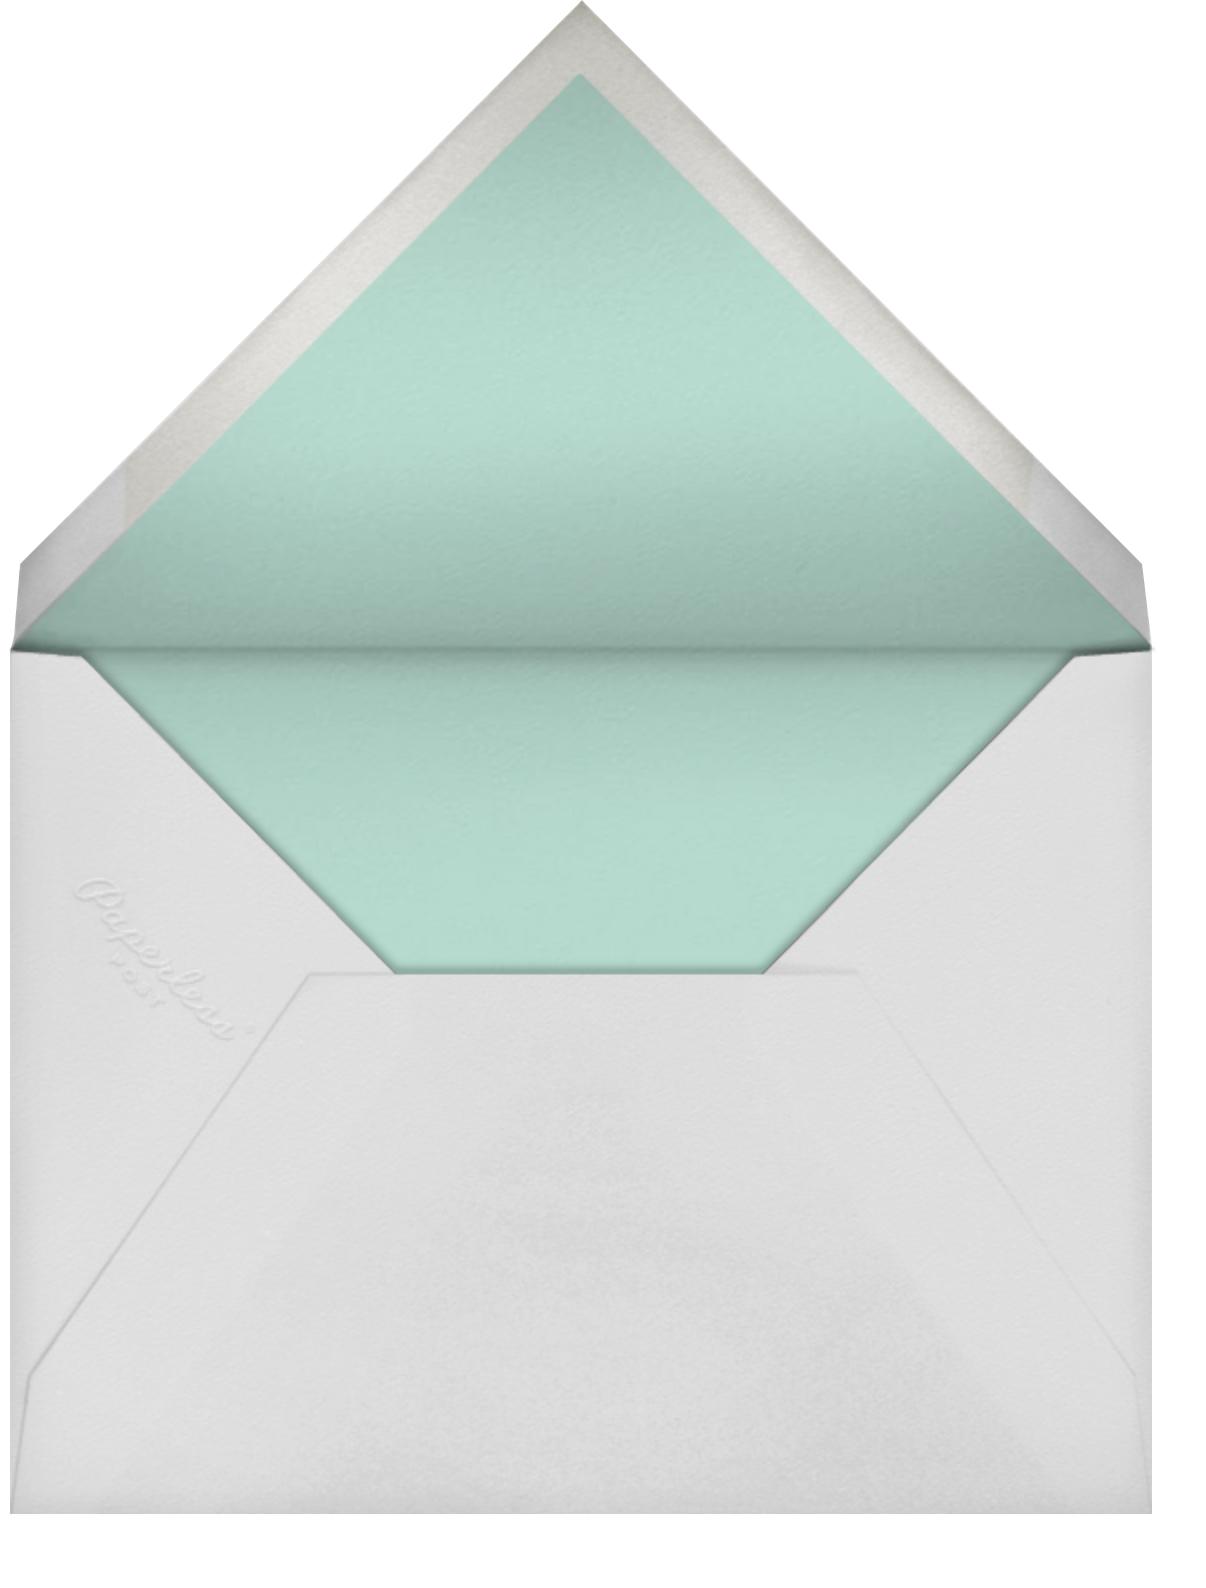 Photo Flourish - Oyster - Paperless Post - Envelope